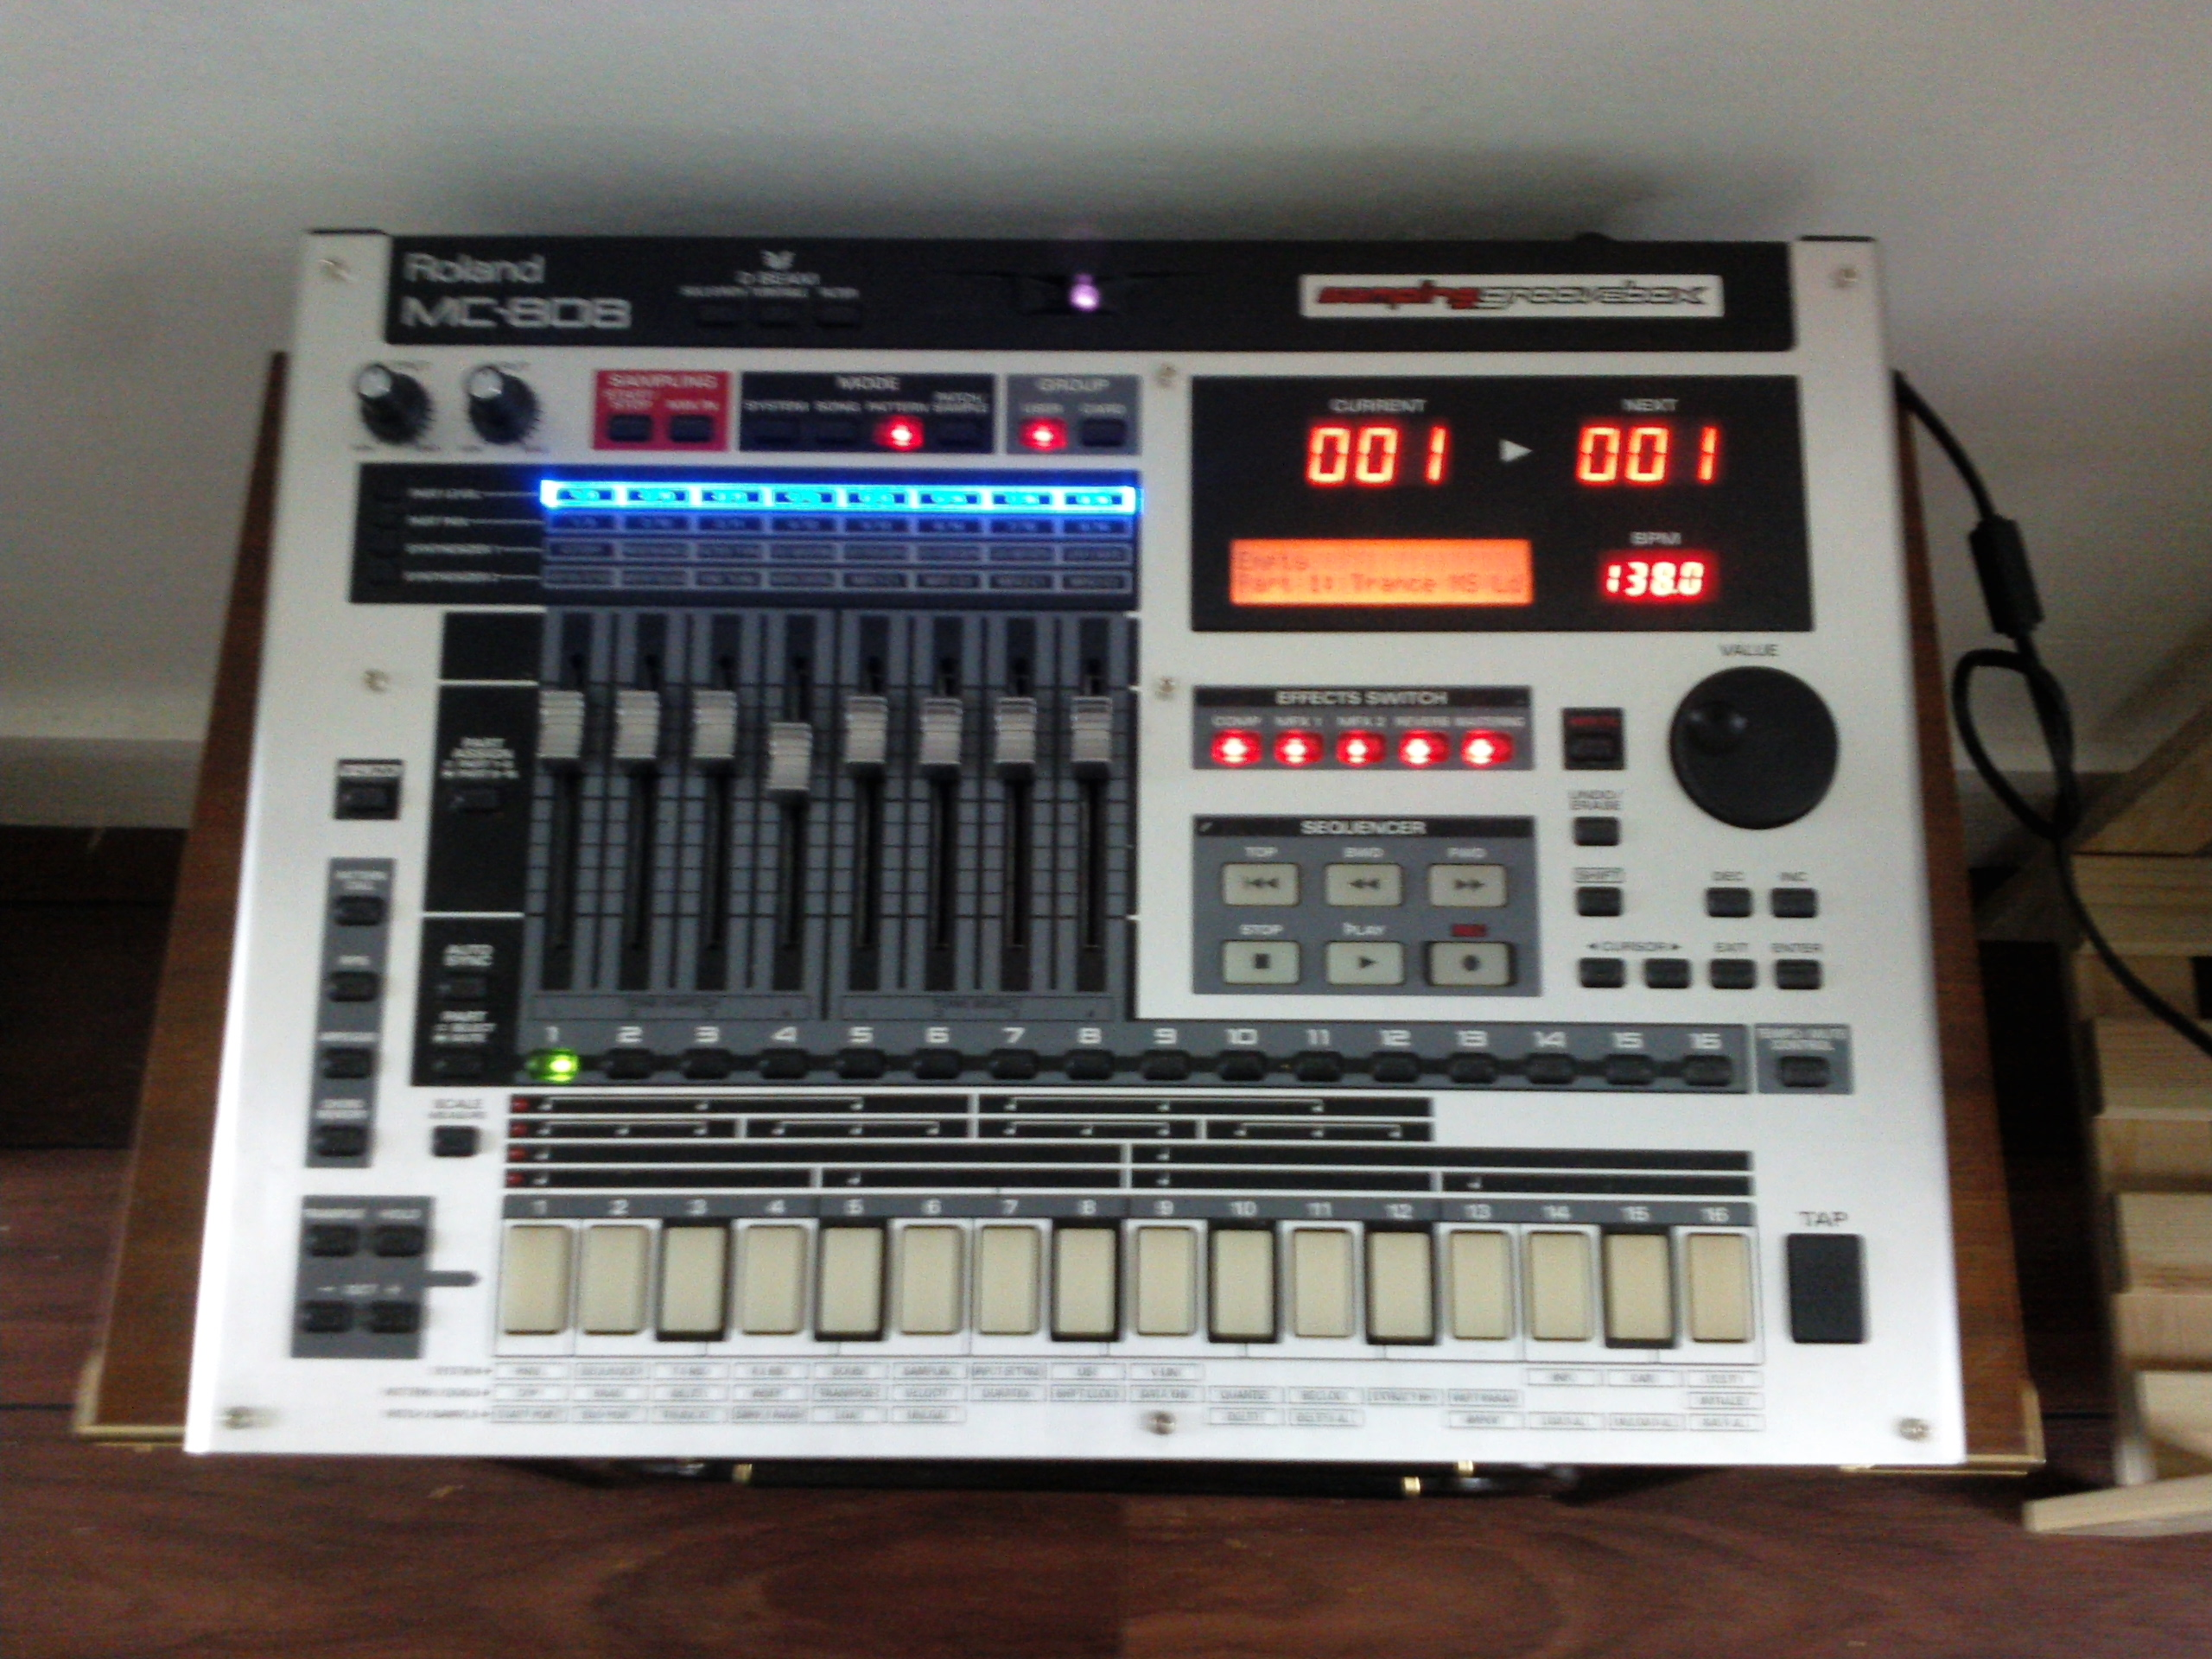 Plug-in equivalent of Roland MC 808/909 Groovebox? - Gearslutz Pro ...